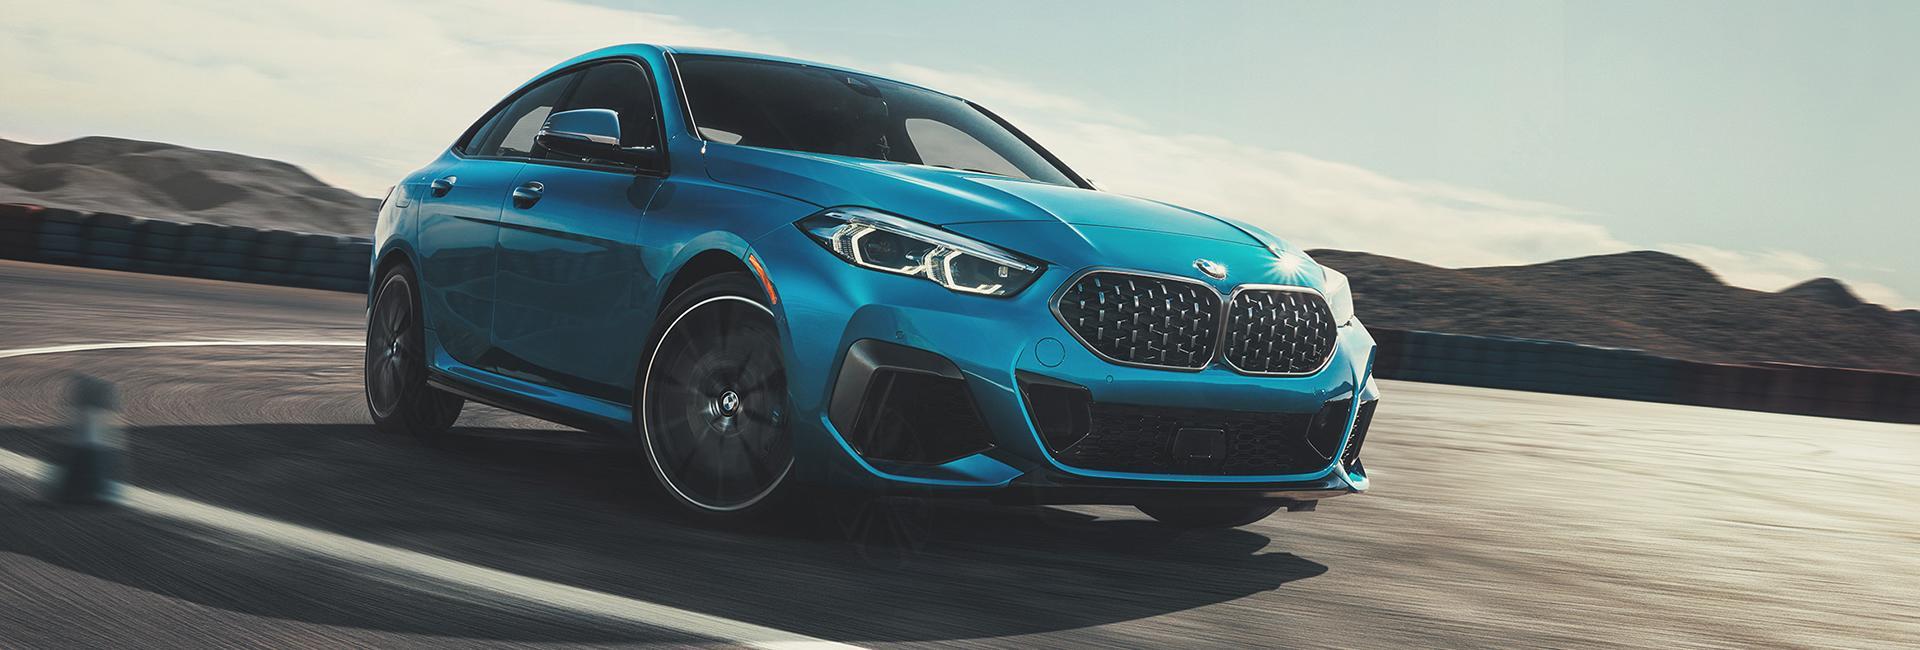 Blue 2020 2 Series BMW